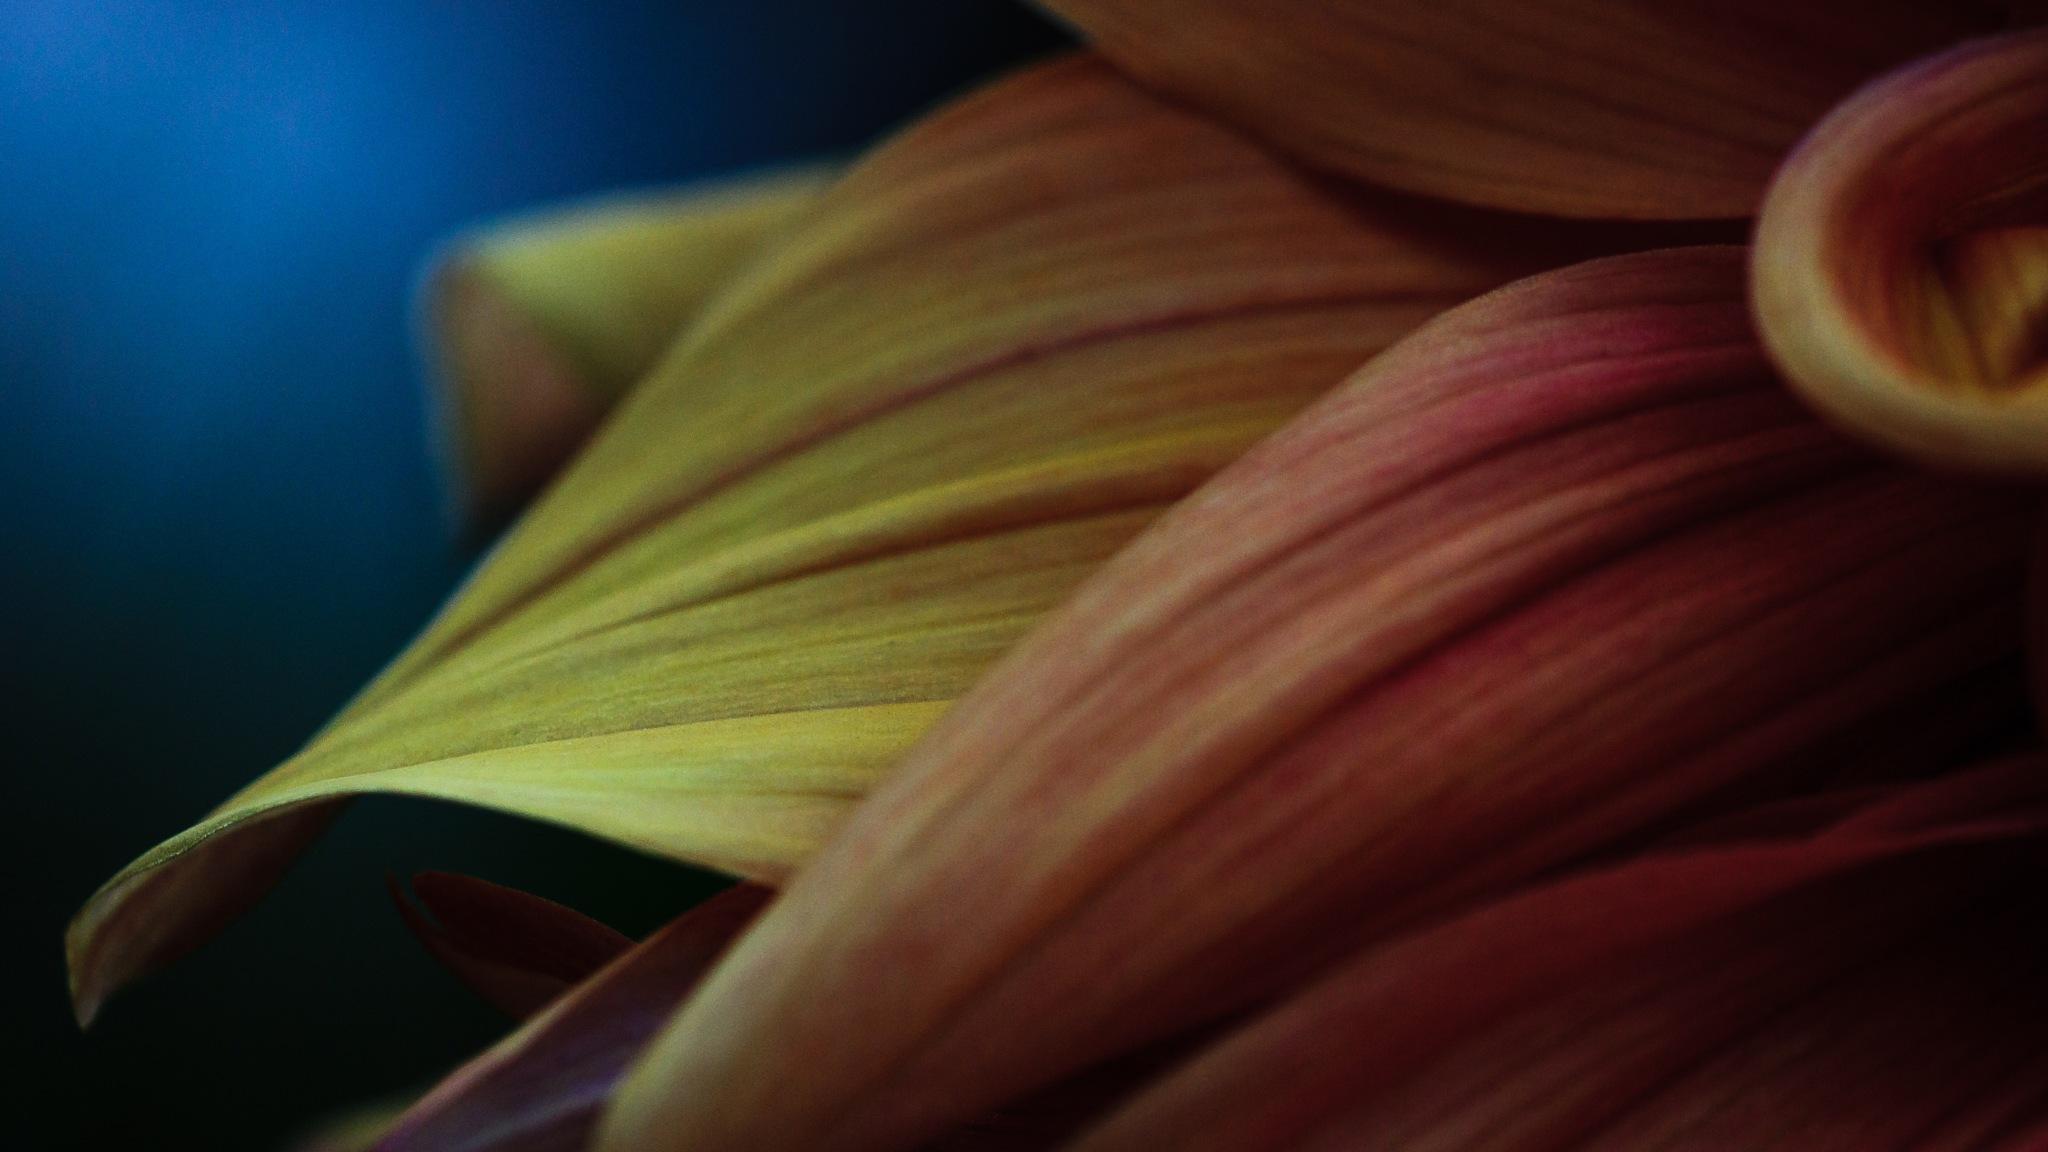 Flower petals close shot by Manuel Gomera Deaño